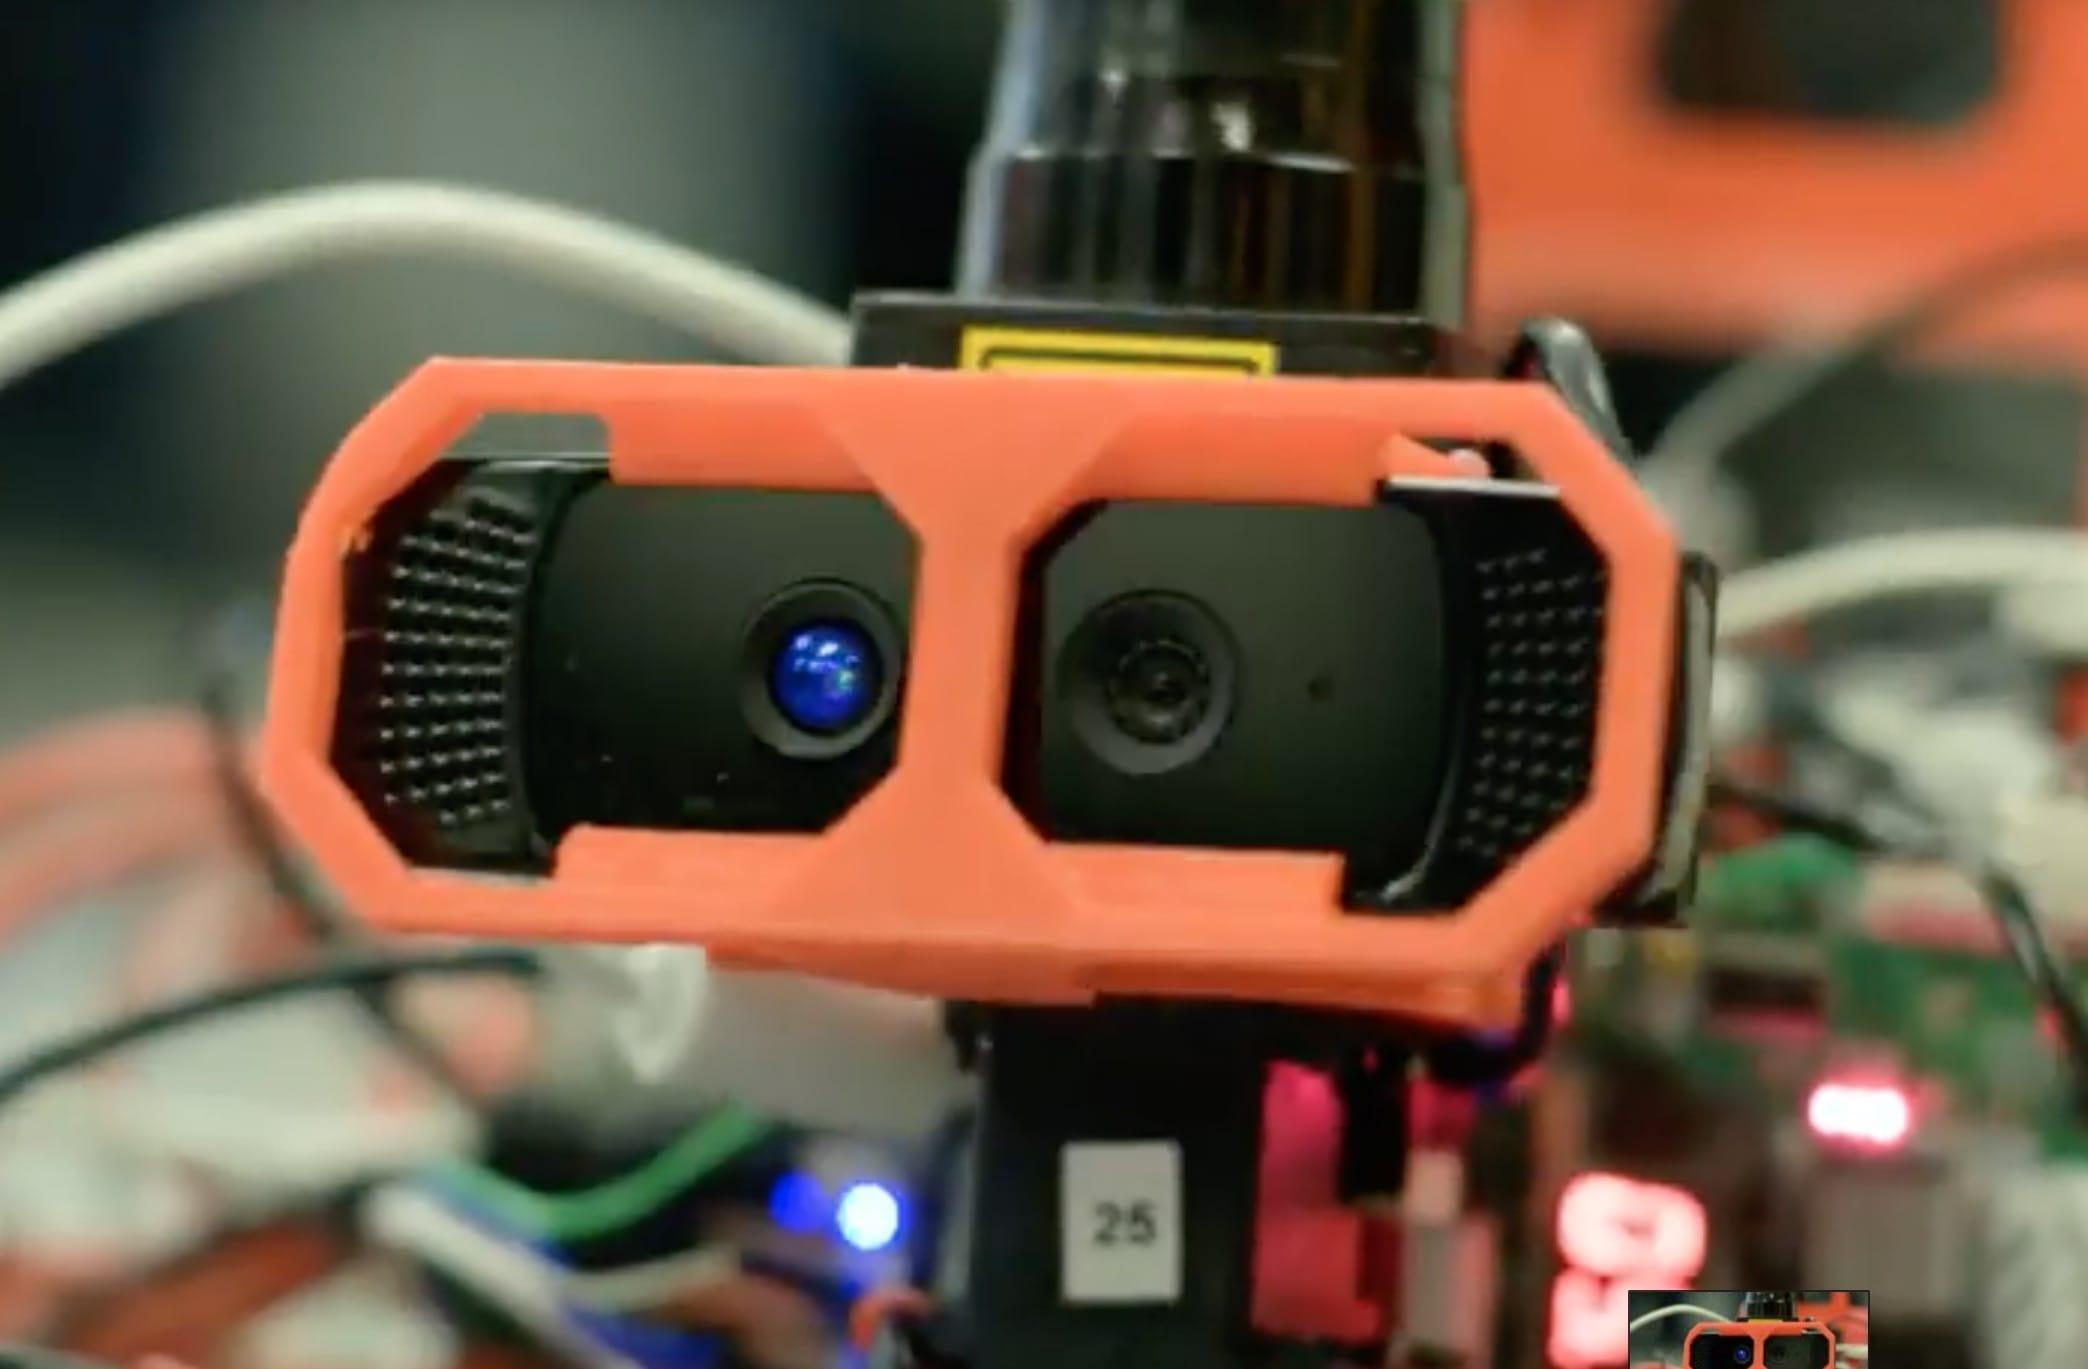 Siemens' experimental production robot